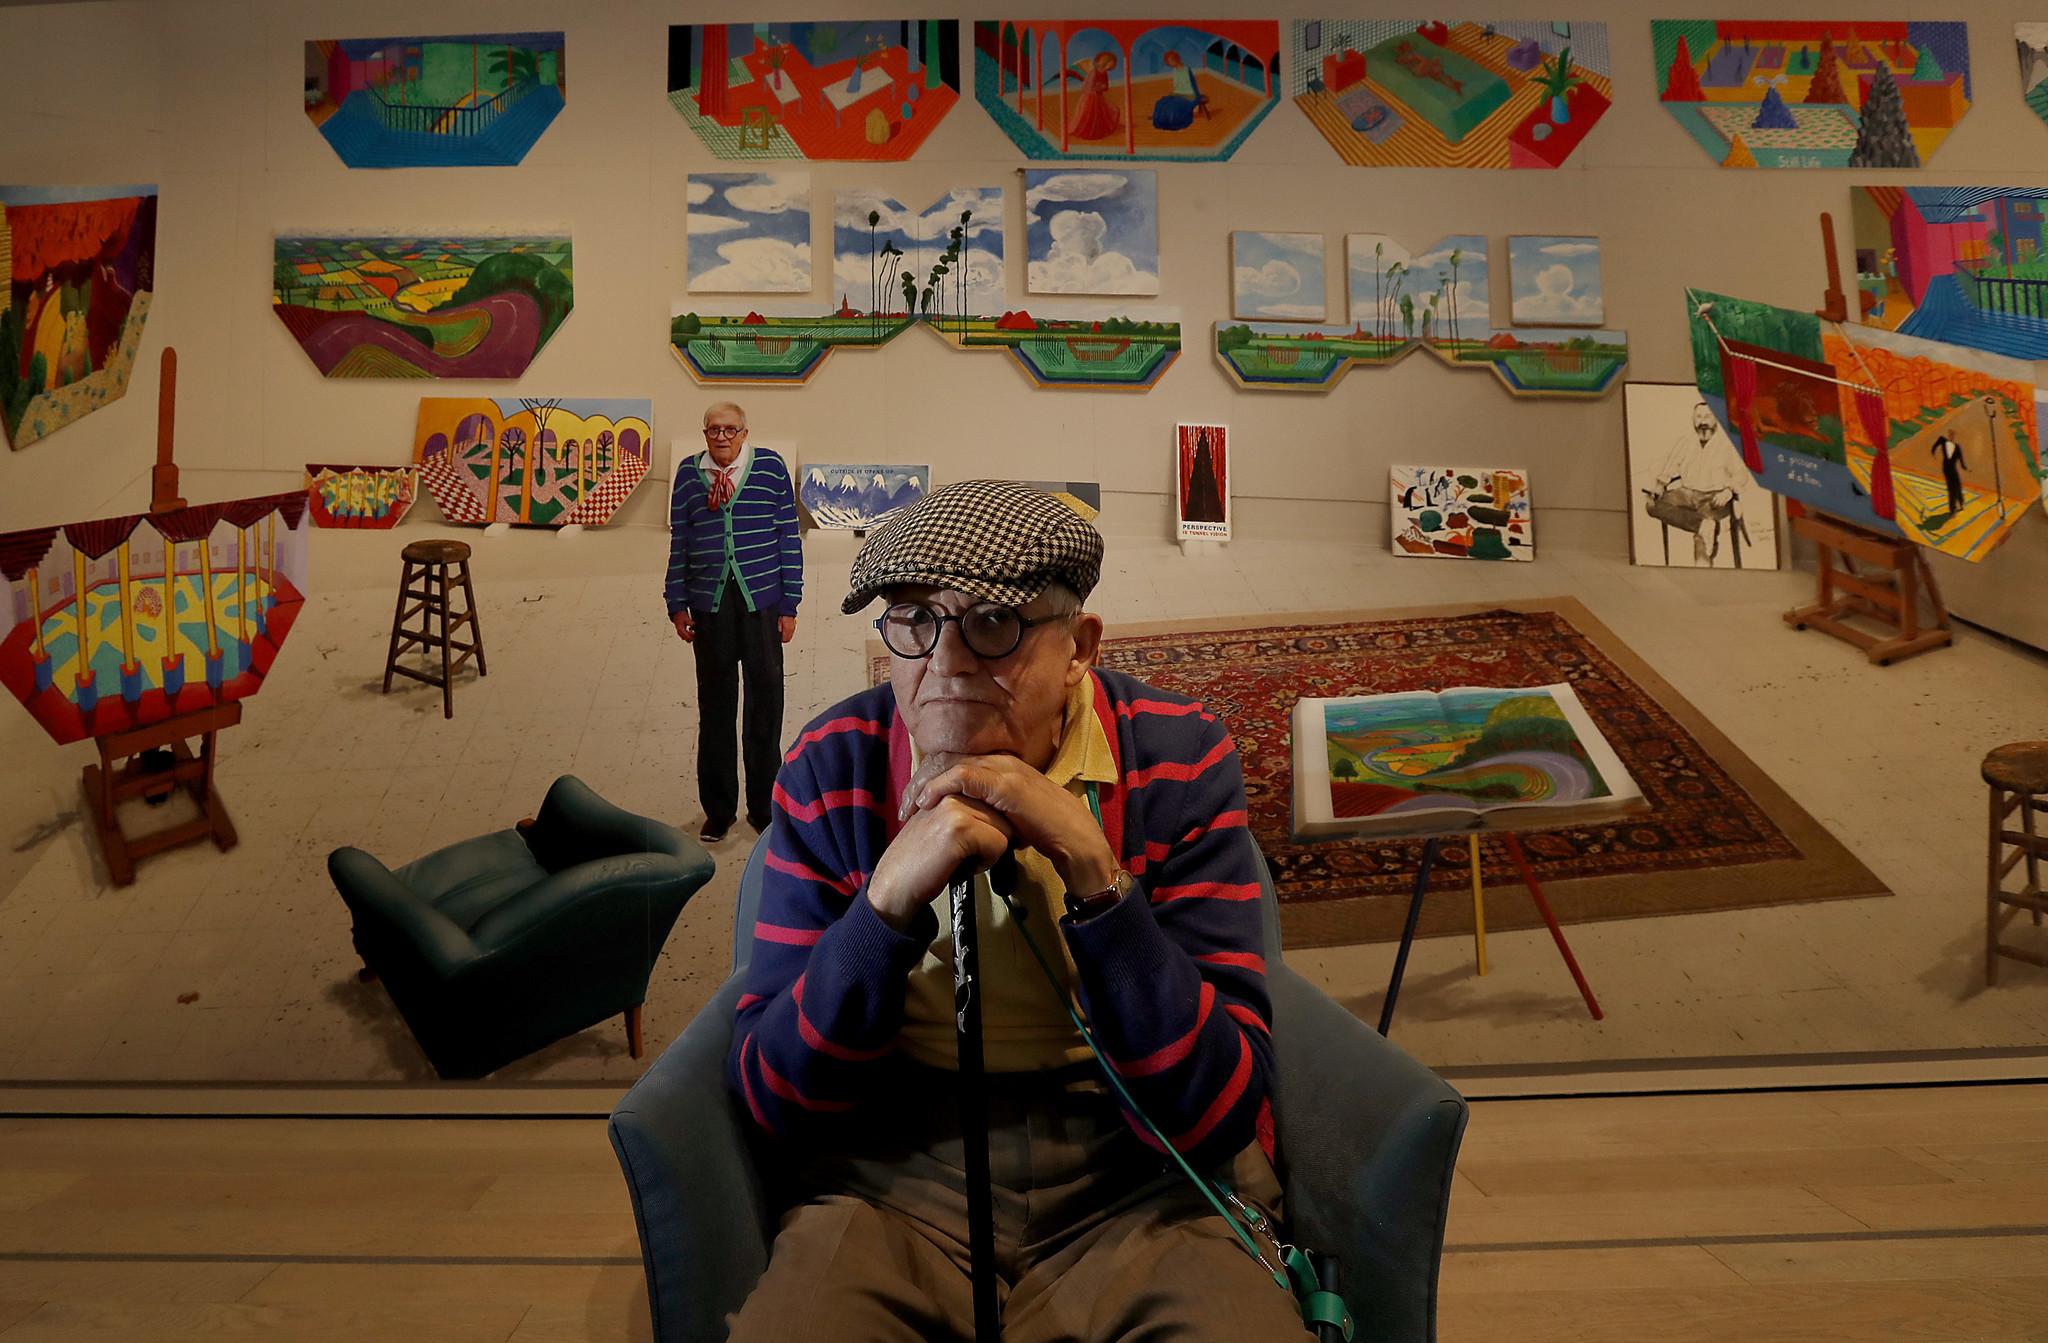 David Hockney at LACMA